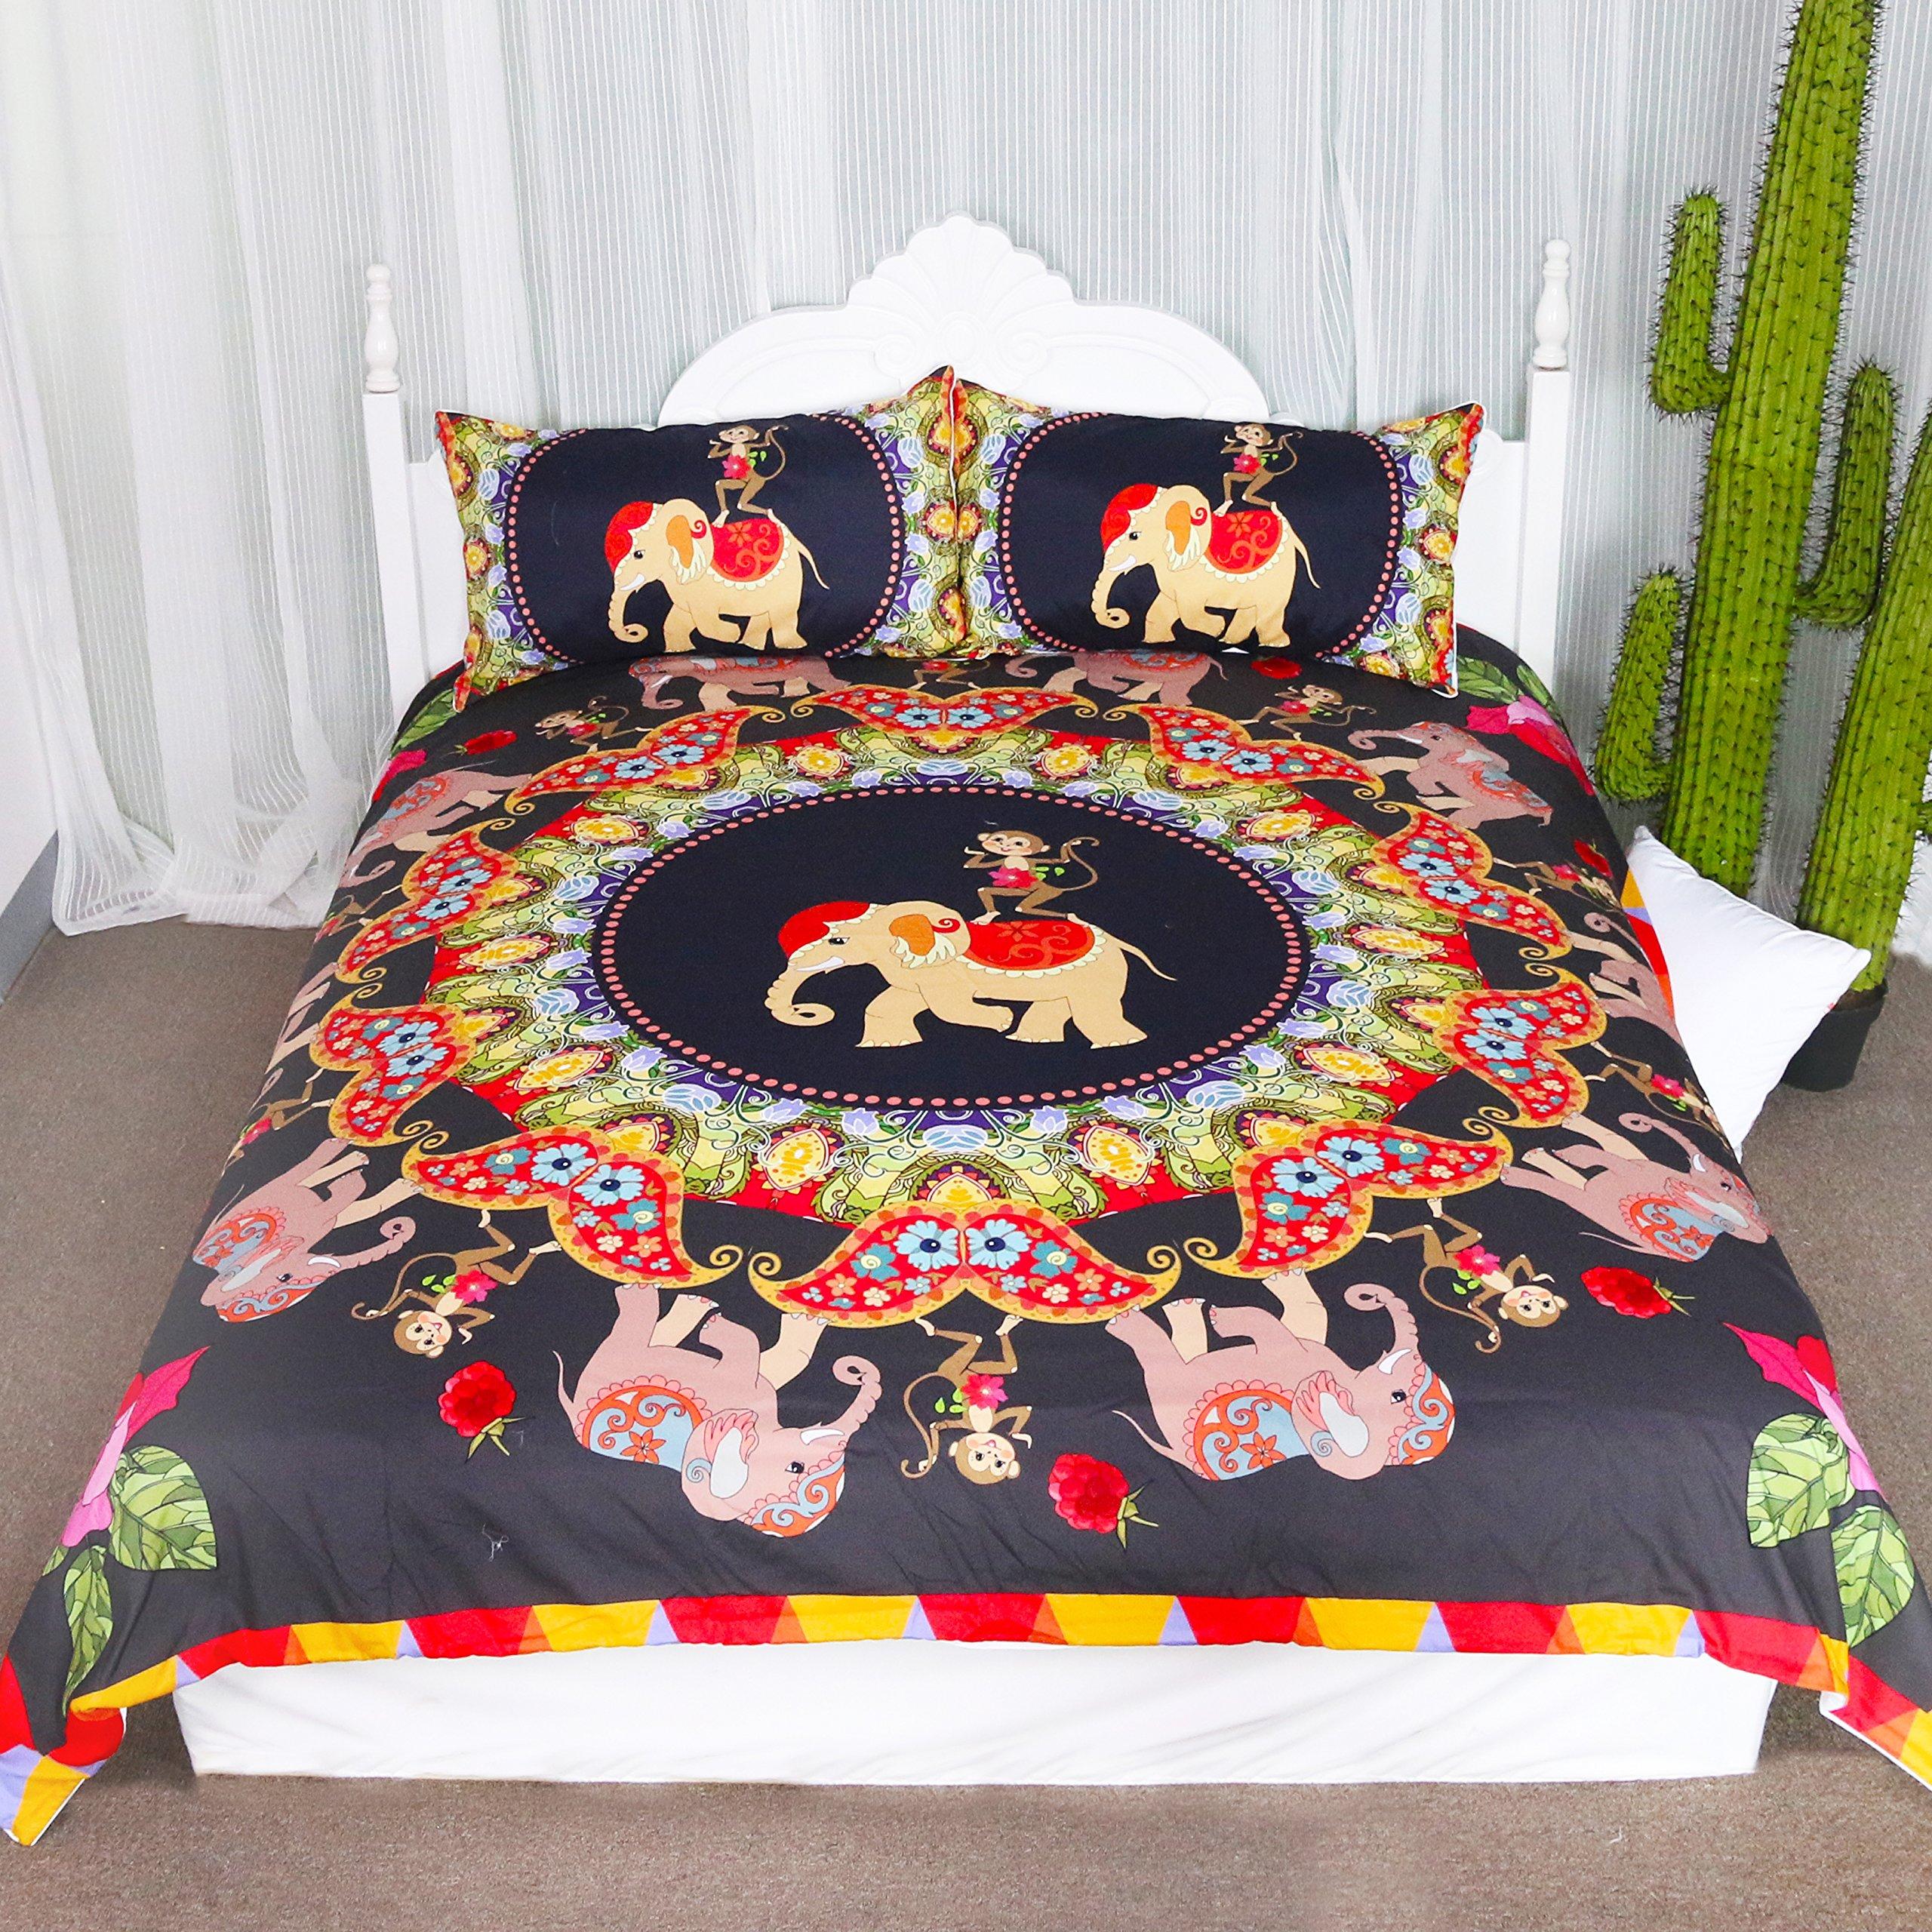 Elephant and Monkey Duvet Cover Set 3 Pieces Jungle Animal Friends Print Bedspread Coverlet Set Safari Gift Ideas Bedding Set (Queen)